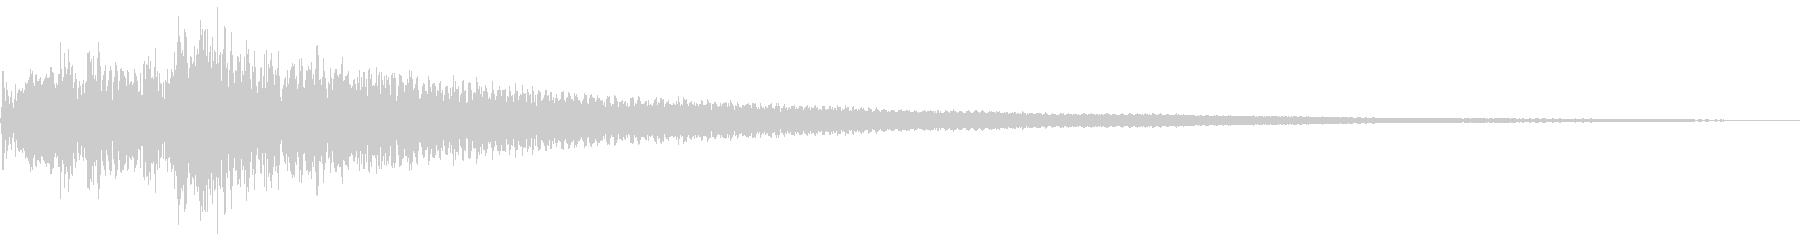 通知・決定・空気感・取得3の未再生の波形